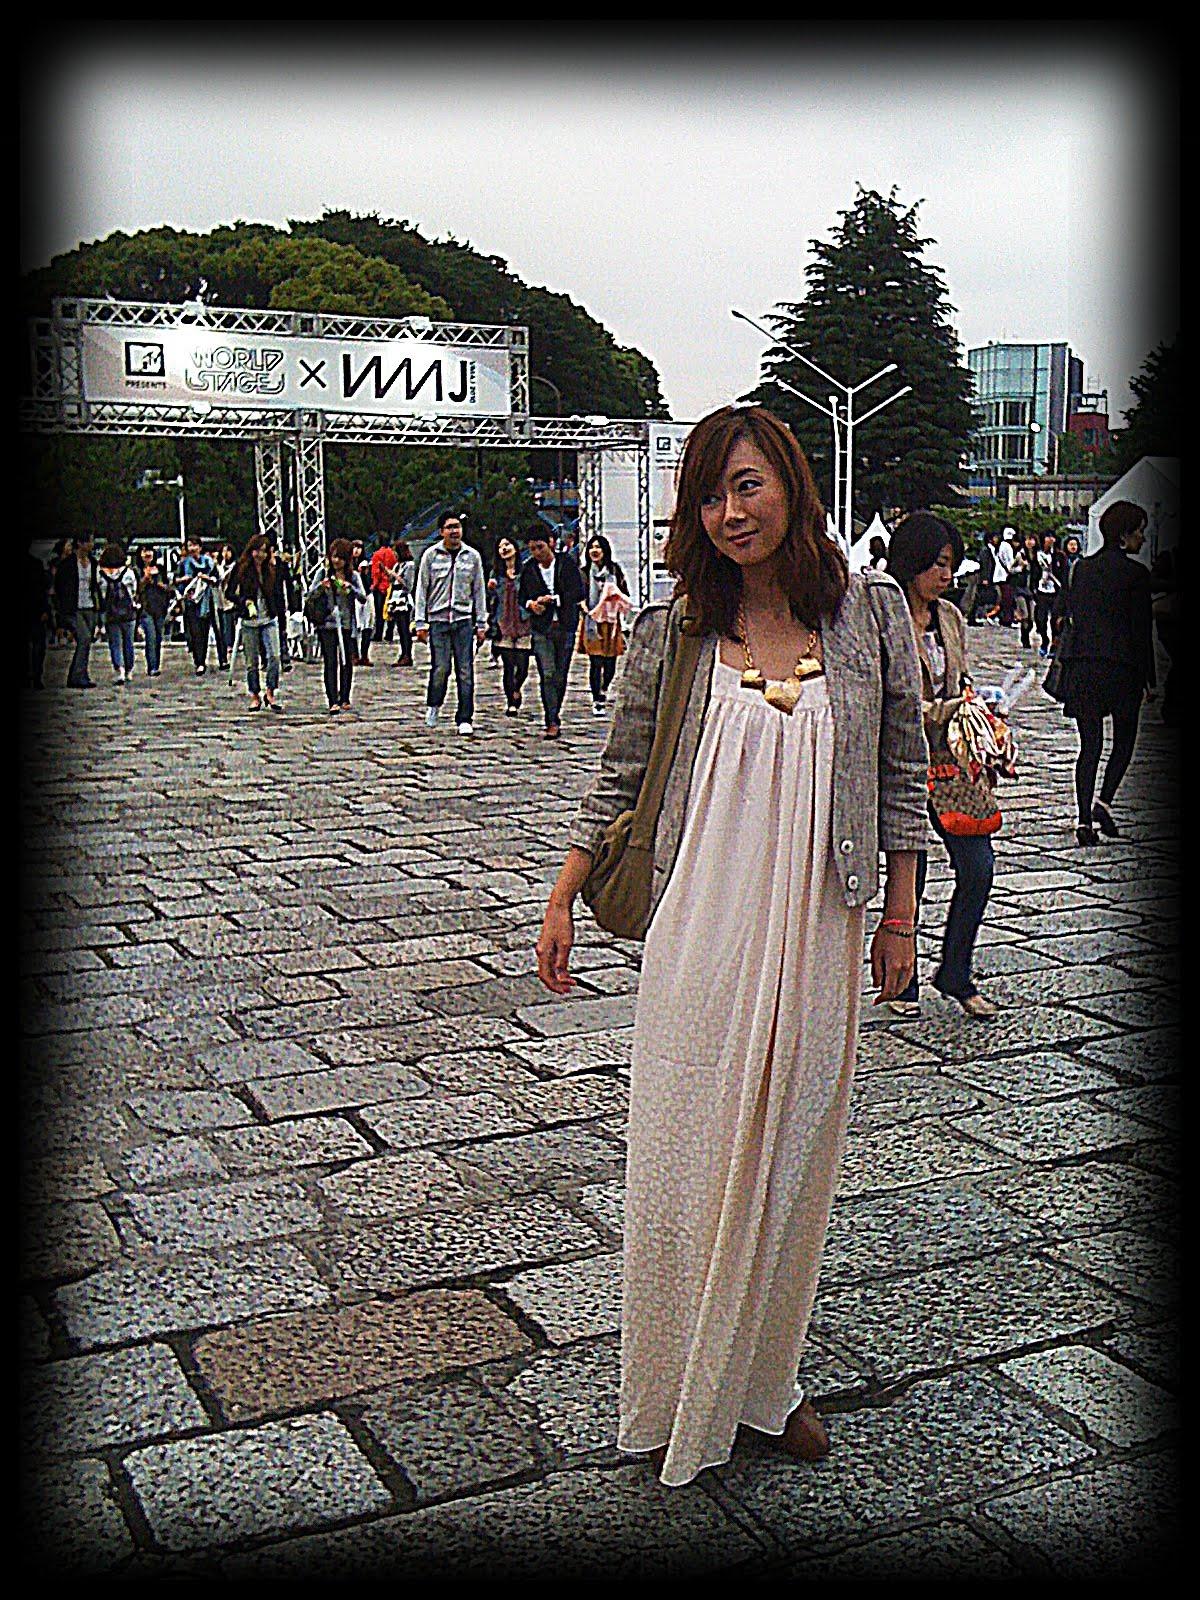 http://4.bp.blogspot.com/_aTMoO-tX_u0/TAPBkj7UsSI/AAAAAAAABFI/inNv6hPI6JU/s1600/IMG_3879.JPG